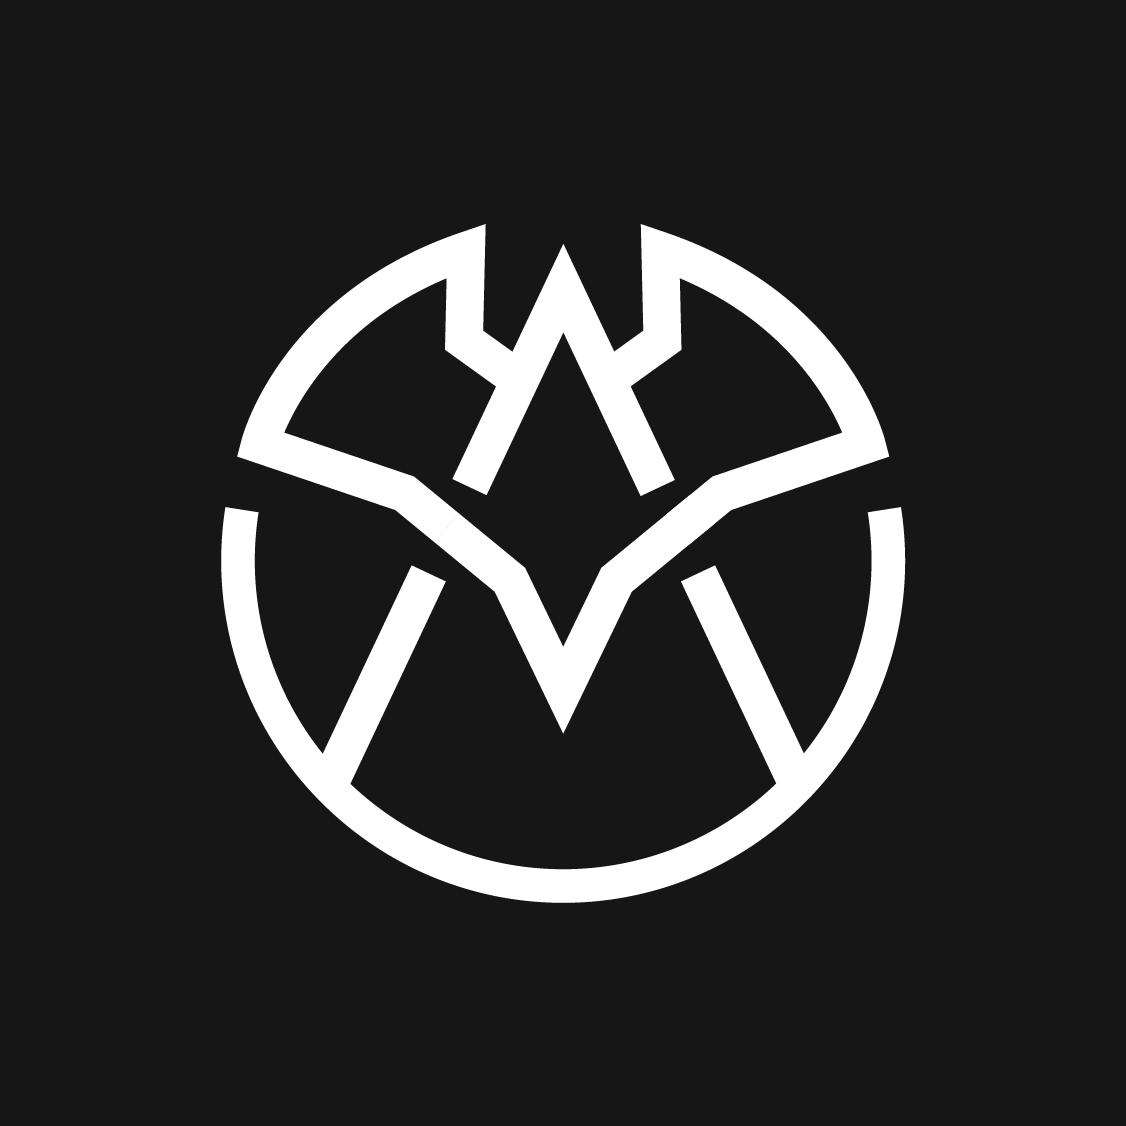 all-logos-2020-48